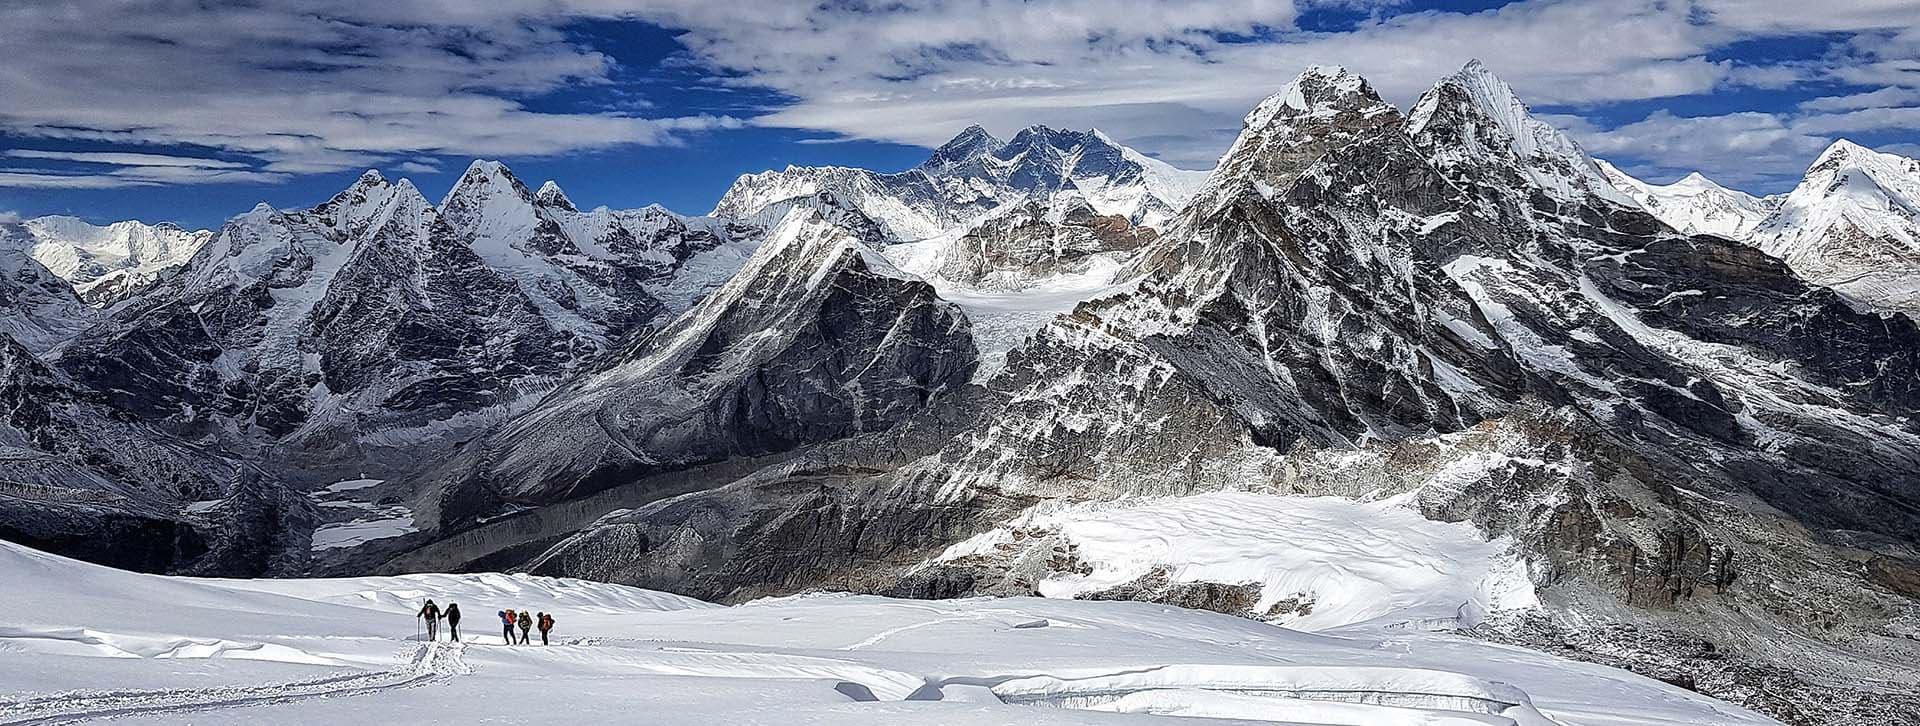 Ascension al mera, nepal